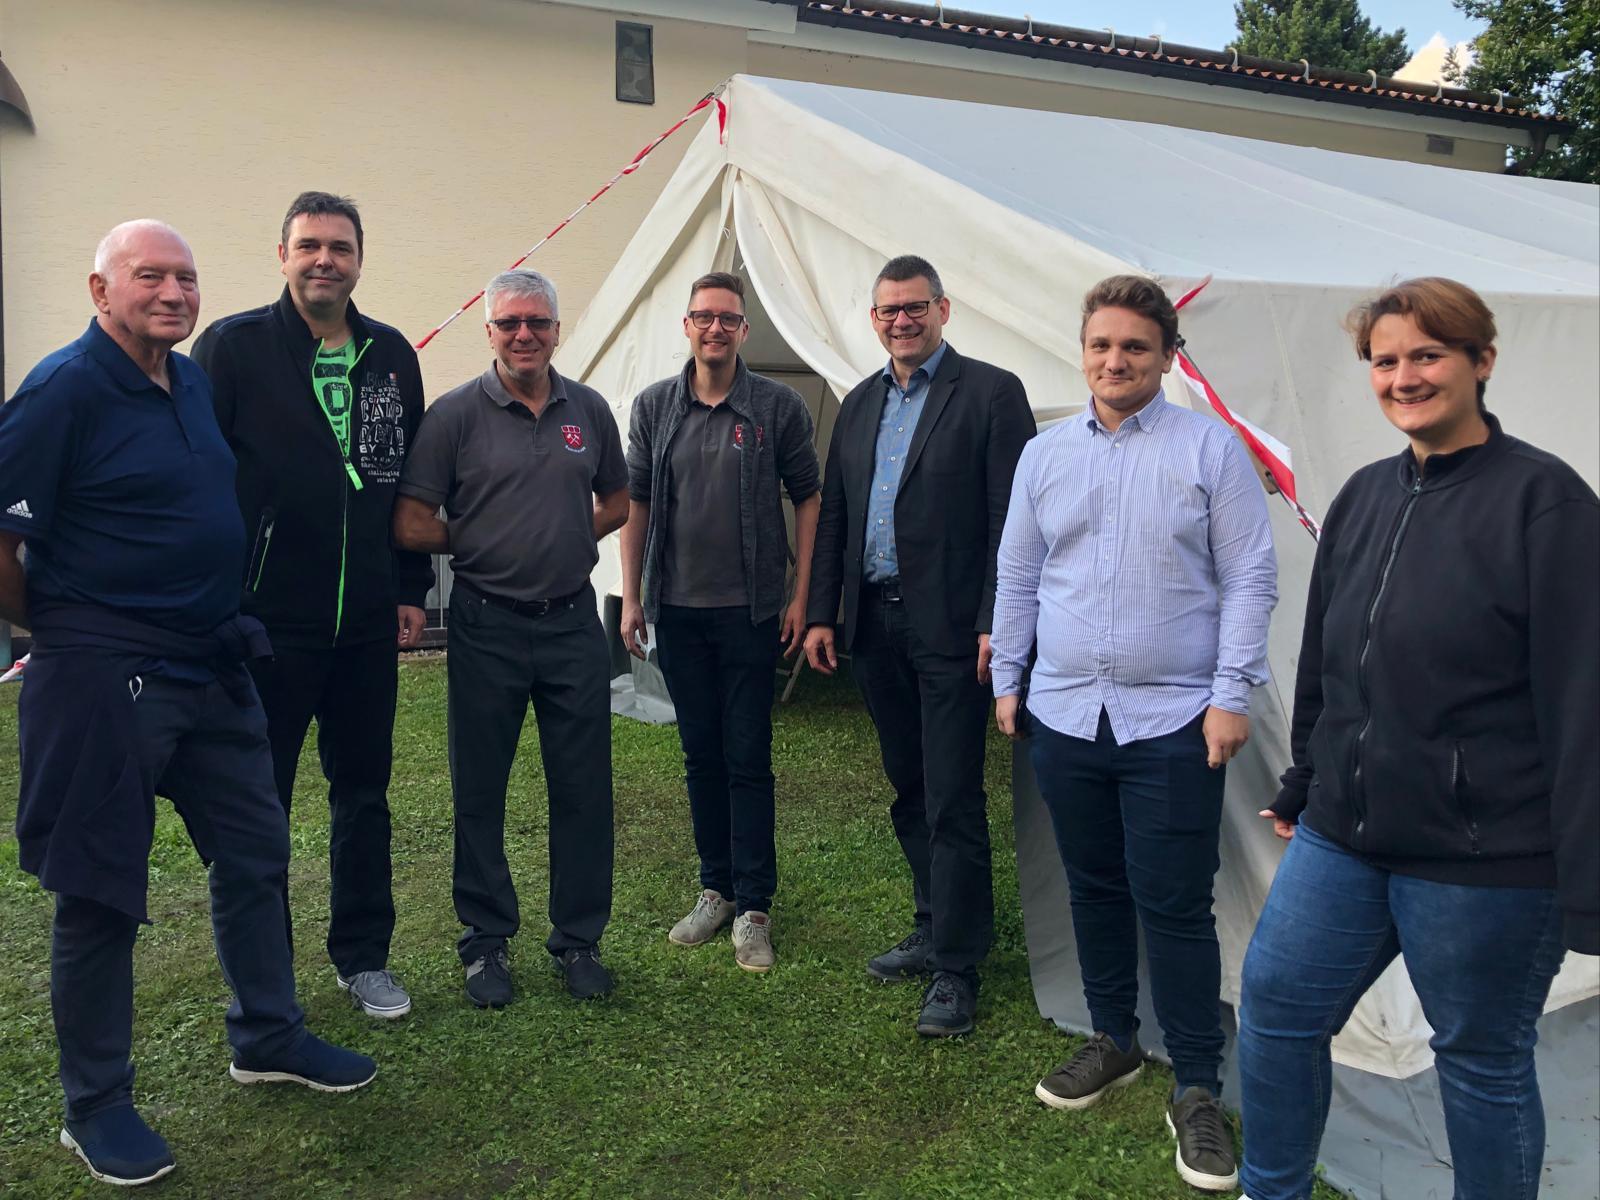 Kegelbahngaststätte in Rommerode eröffnet